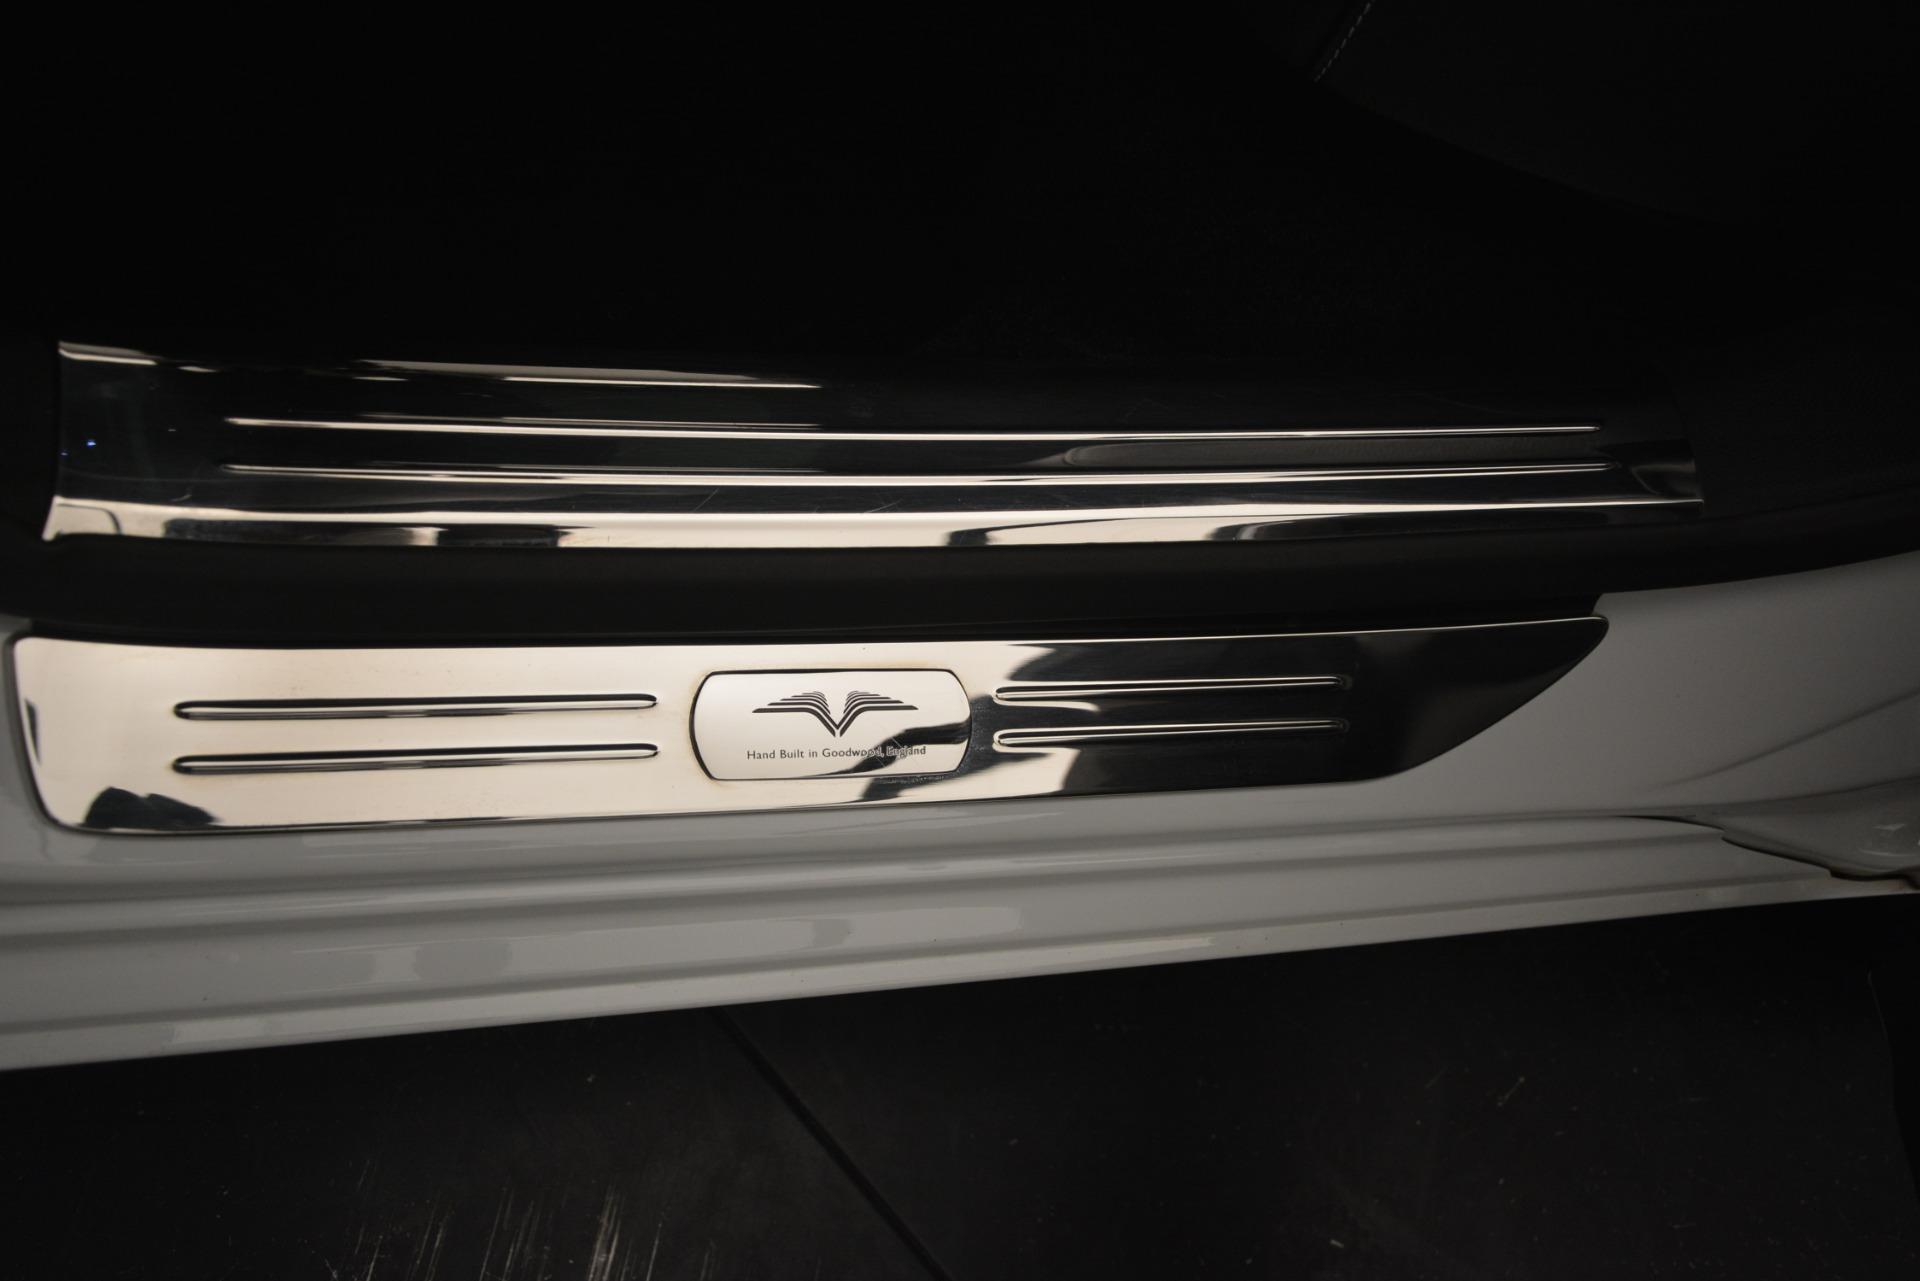 Used 2014 Rolls-Royce Ghost V-Spec For Sale In Westport, CT 2989_p20